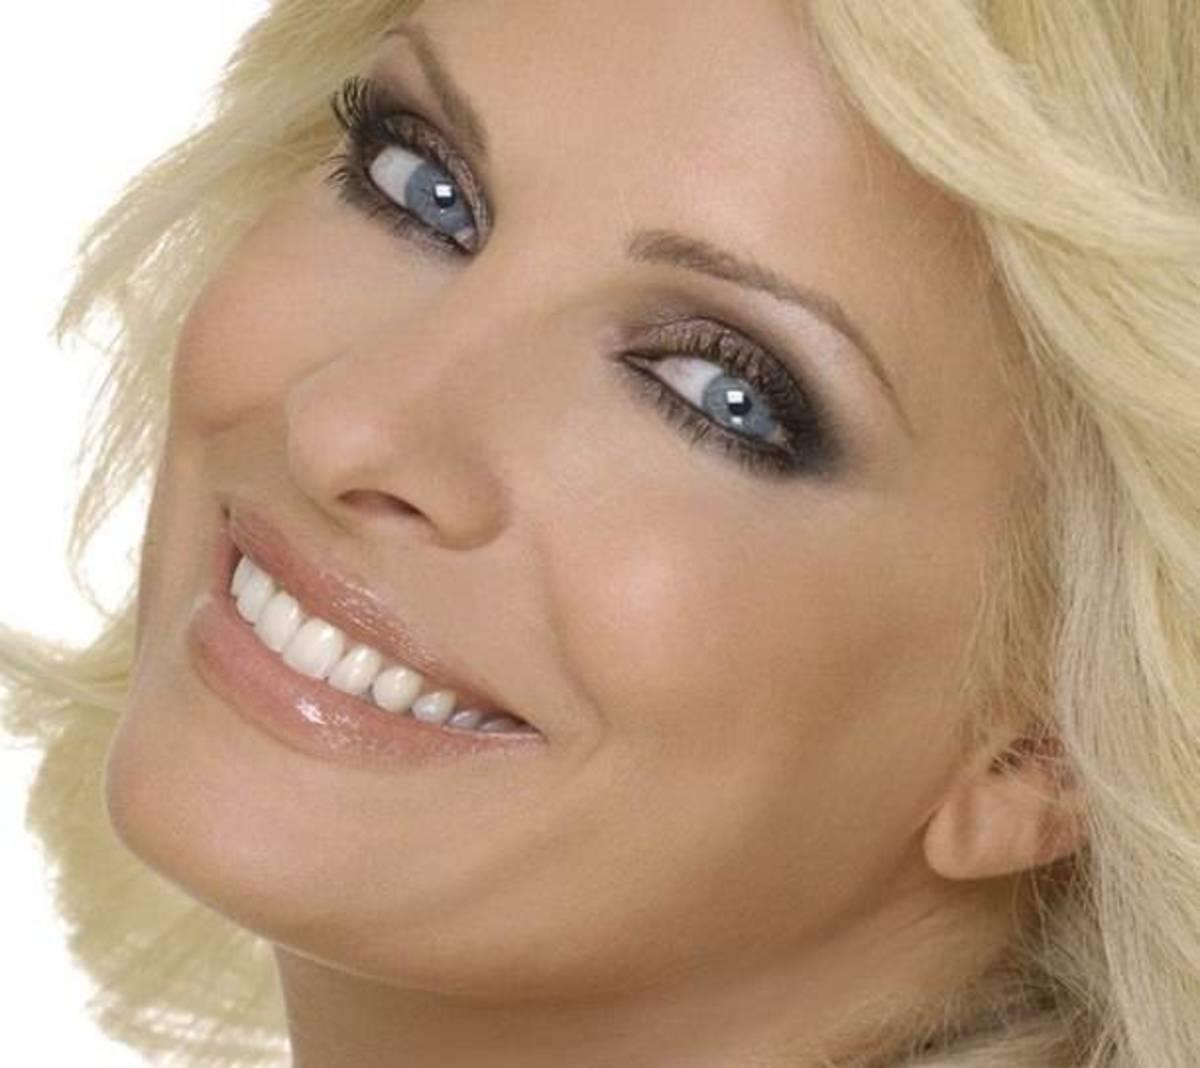 Mες την εβδομάδα το καθοριστικό ραντεβού της Ελένης! Ποιοί μένουν, ποιοί φεύγουν | Newsit.gr